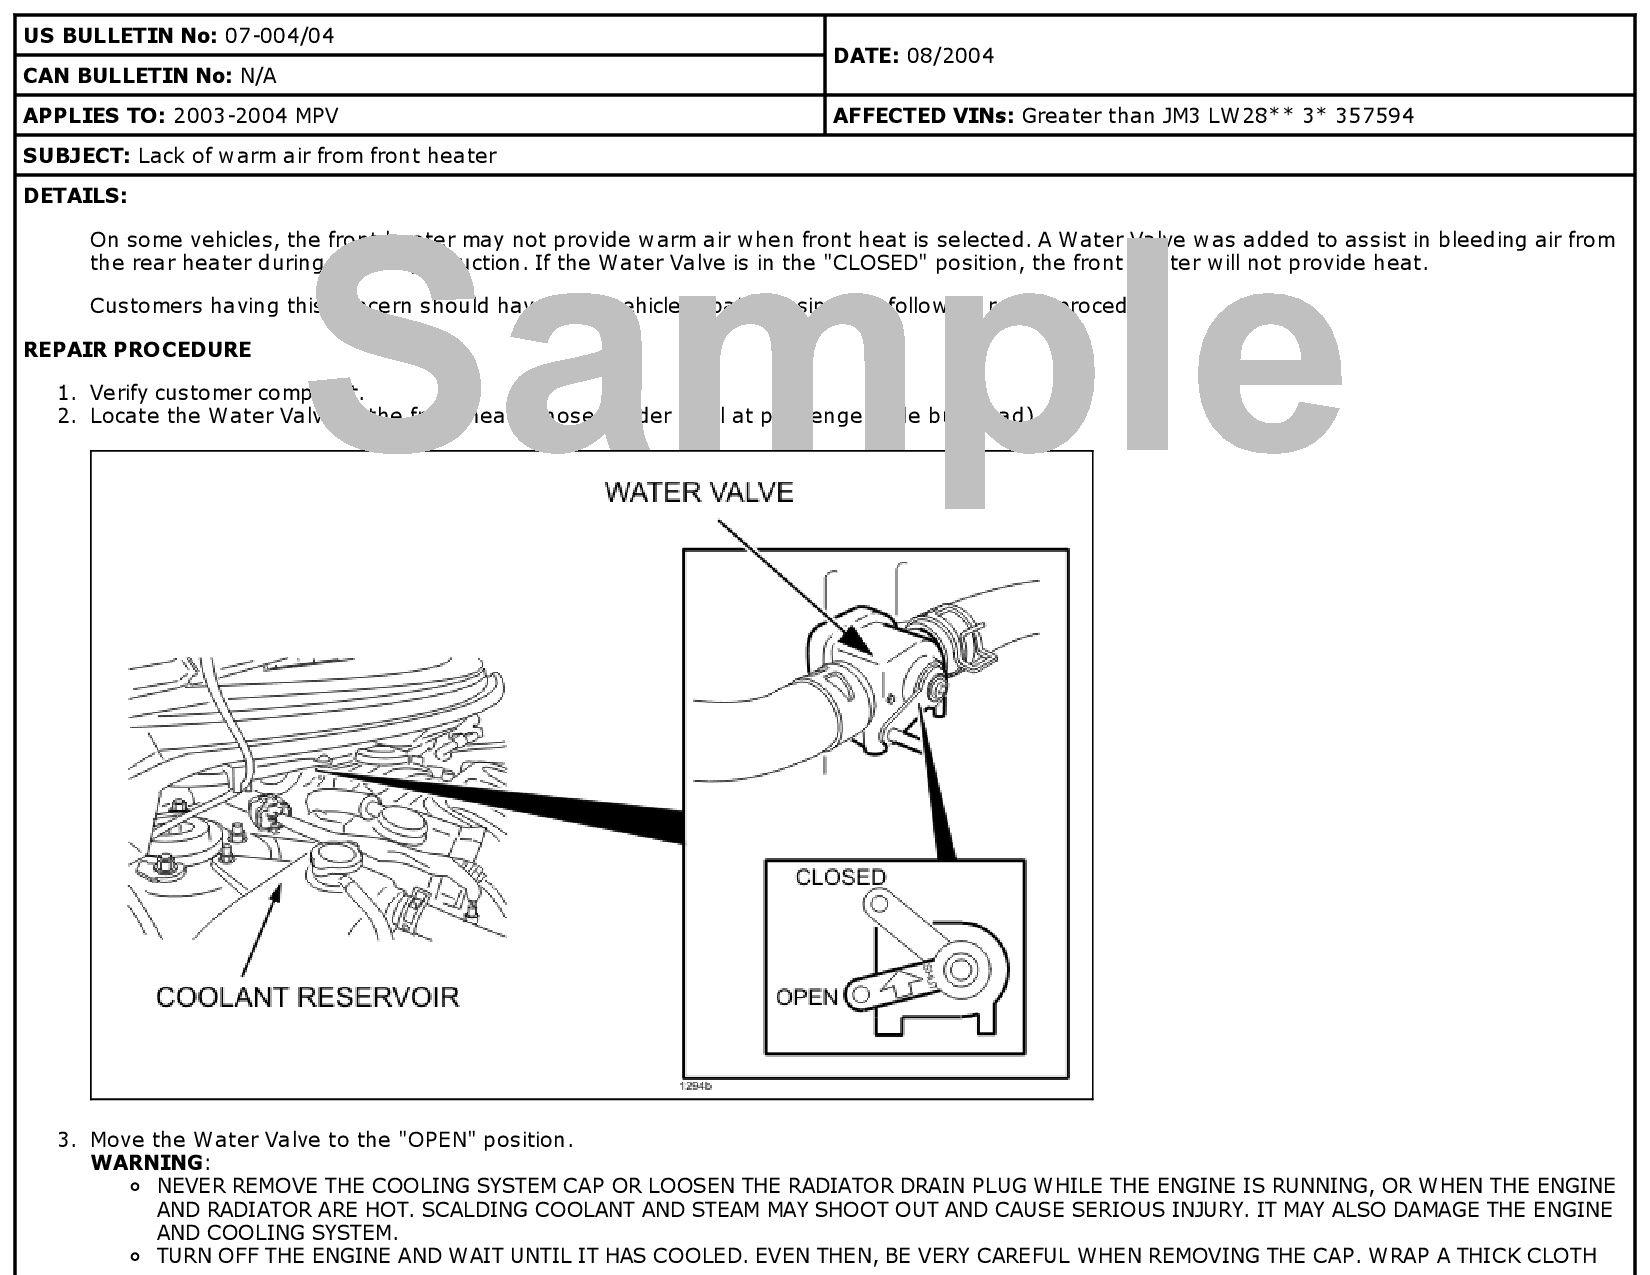 WRG-2891] 2000 Mazda Mpv Engine Diagram Bottom Viewangeltopshop290706.mx.tl